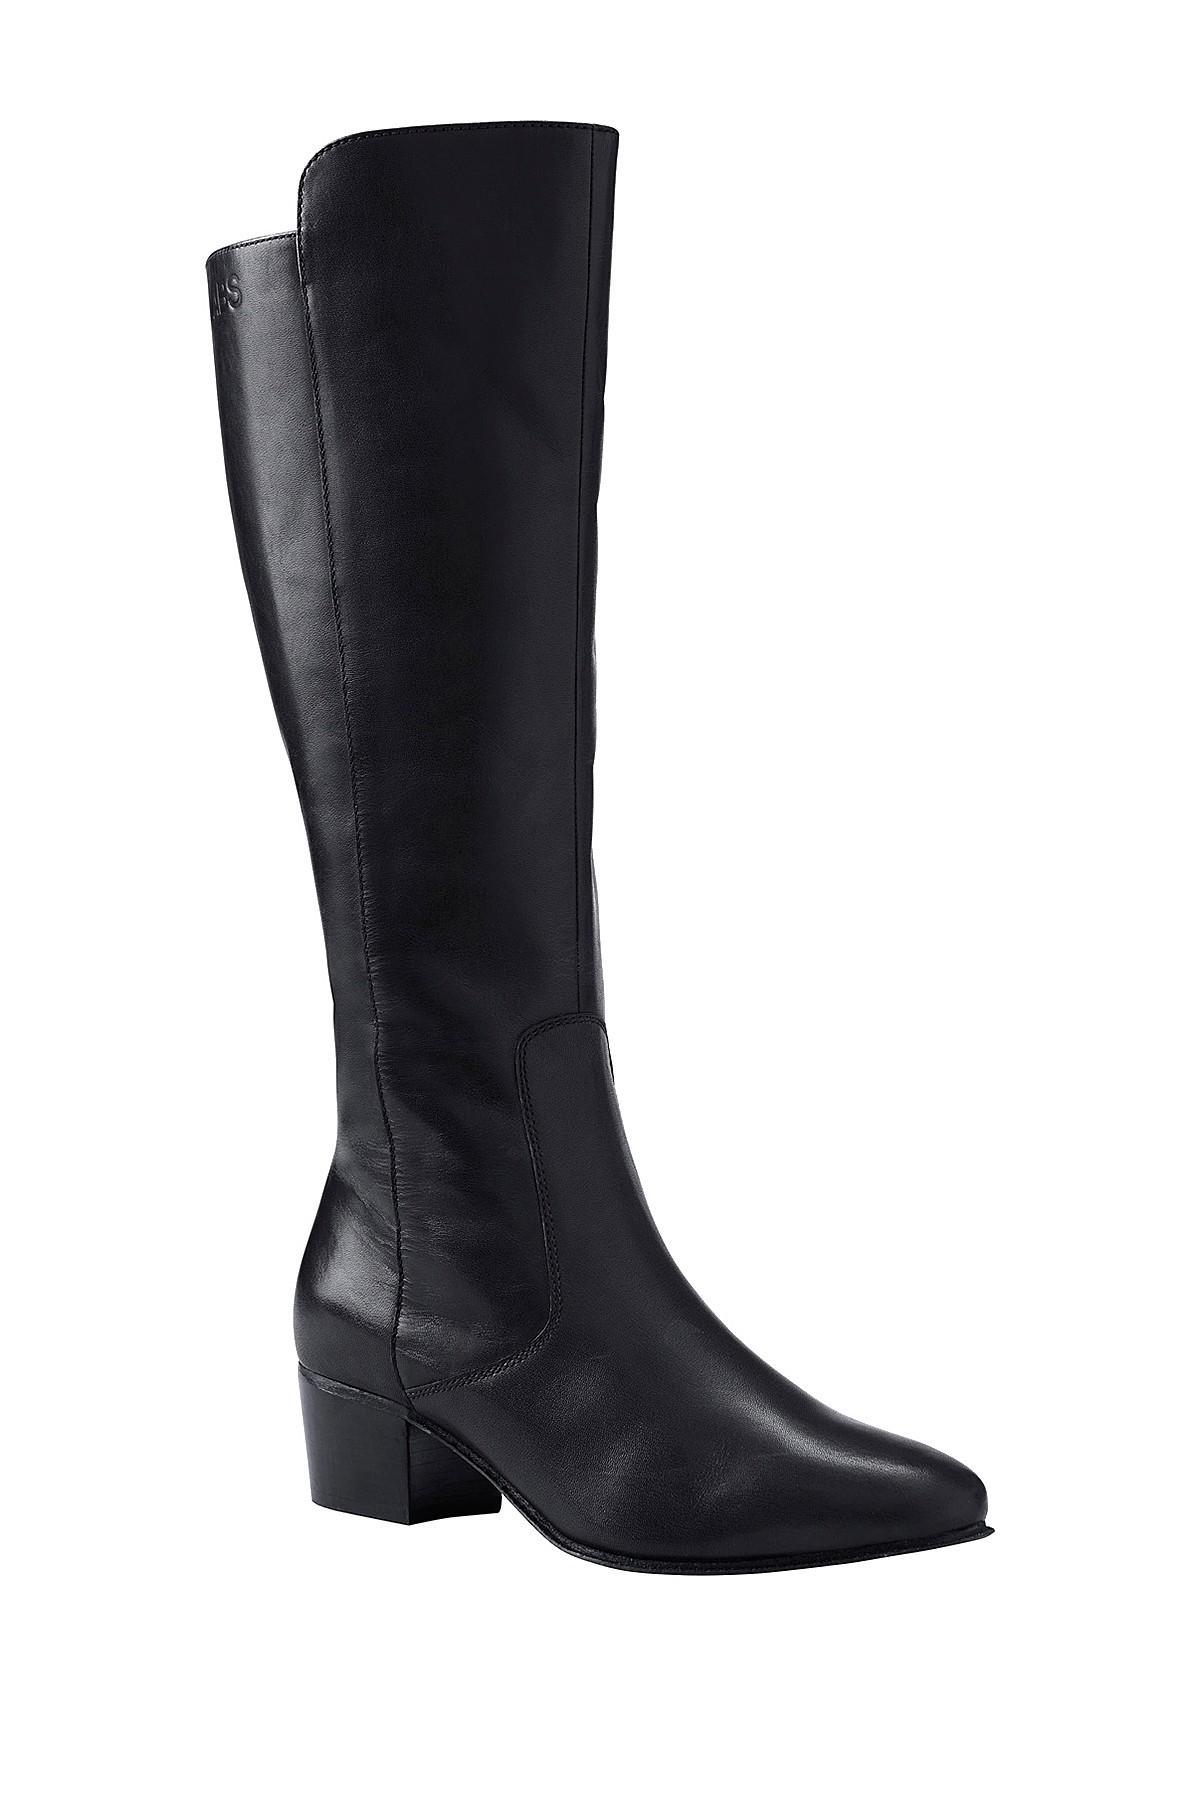 lands end dress boot in black lyst